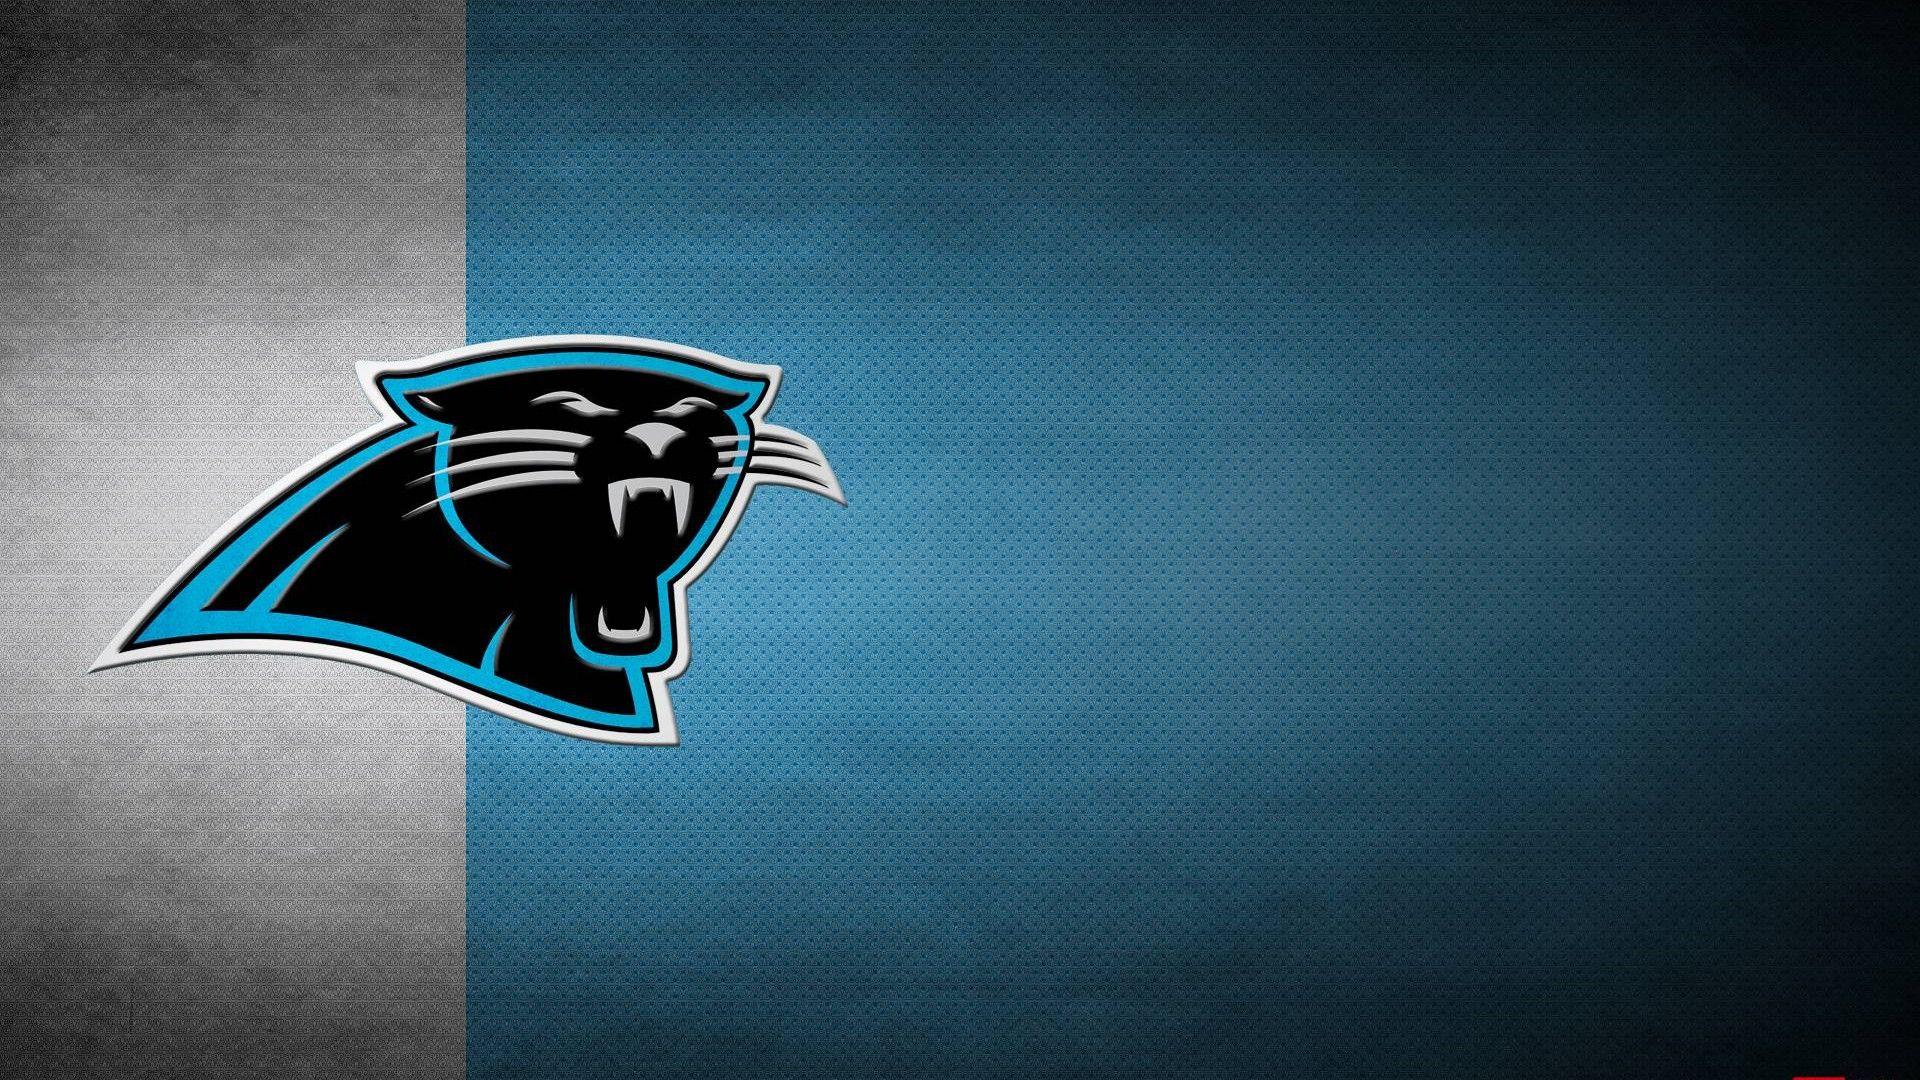 Carolina Panthers Nfl Desktop Wallpapers 2021 Nfl Football Wallpapers Carolina Panthers Wallpaper Nfl Football Wallpaper Carolina Panthers